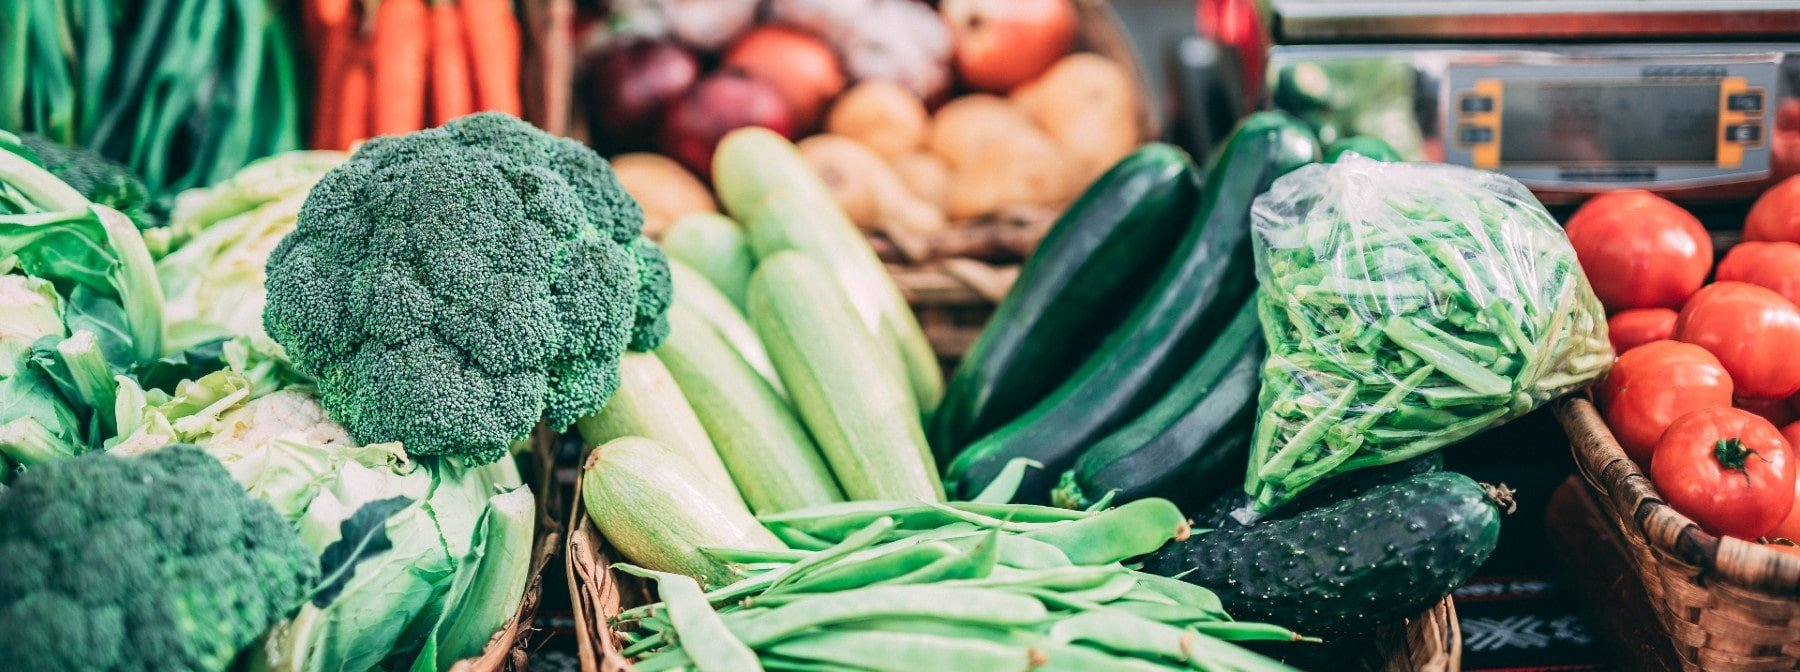 Dein Low Carb Gemüse Guide